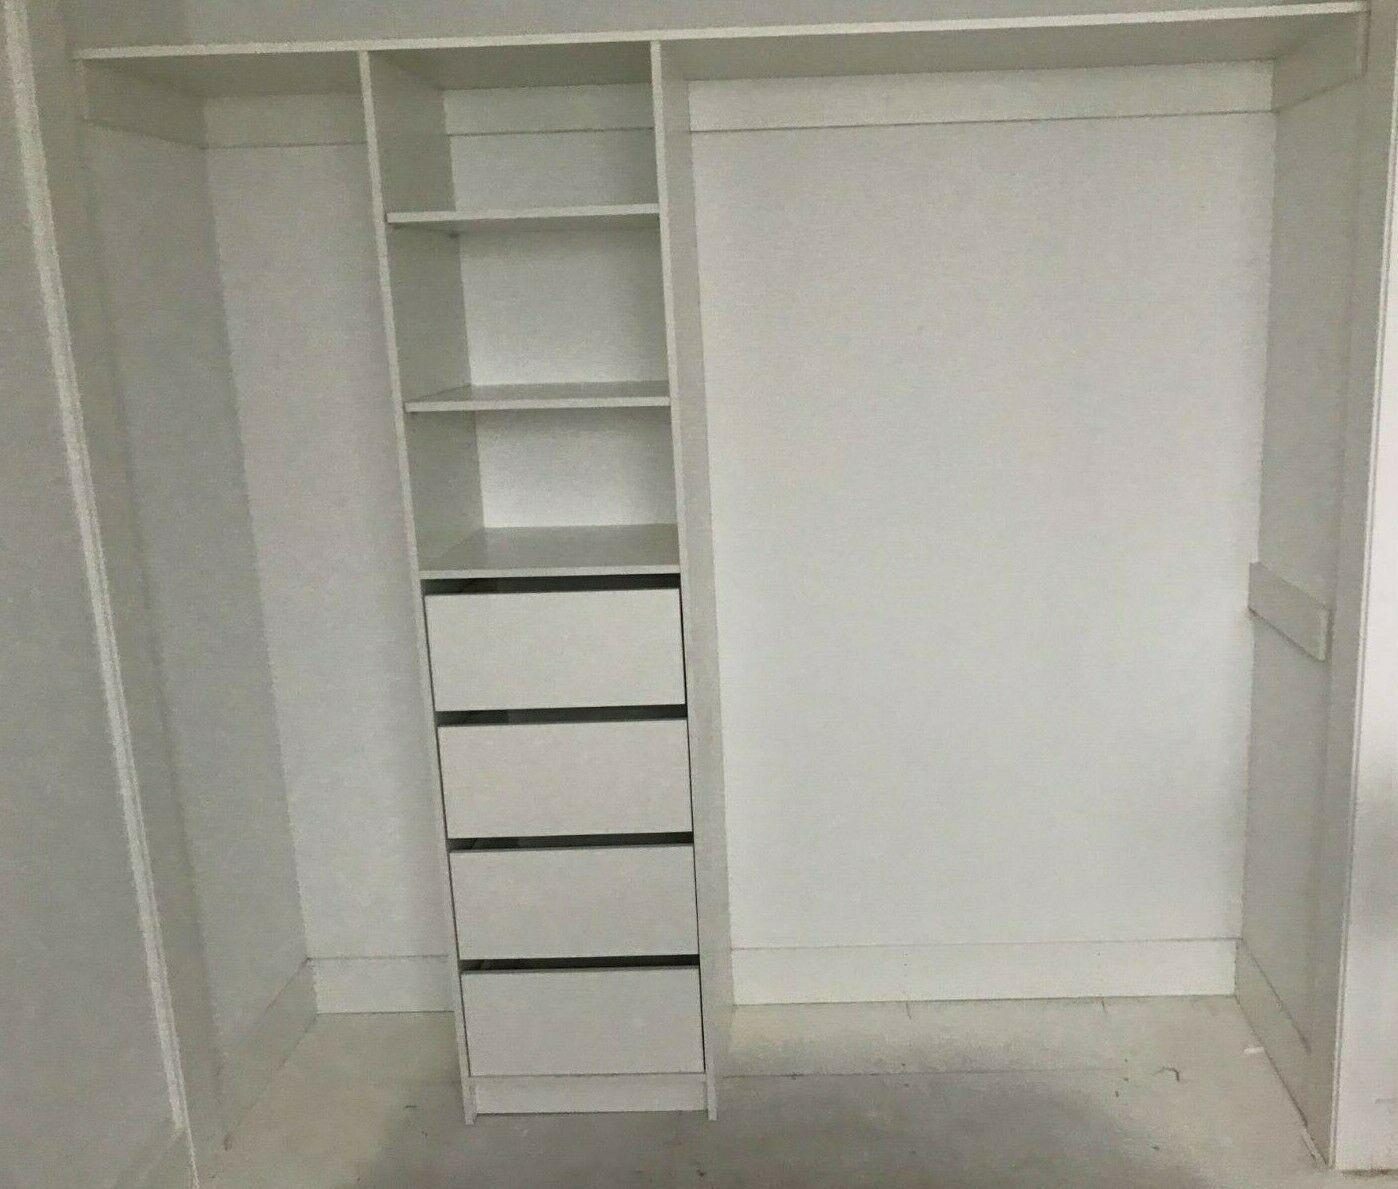 Wardrobe Insert Complete Package Assembled In 2020 Closet Storage Space Wardrobe Storage Adjustable Shelving